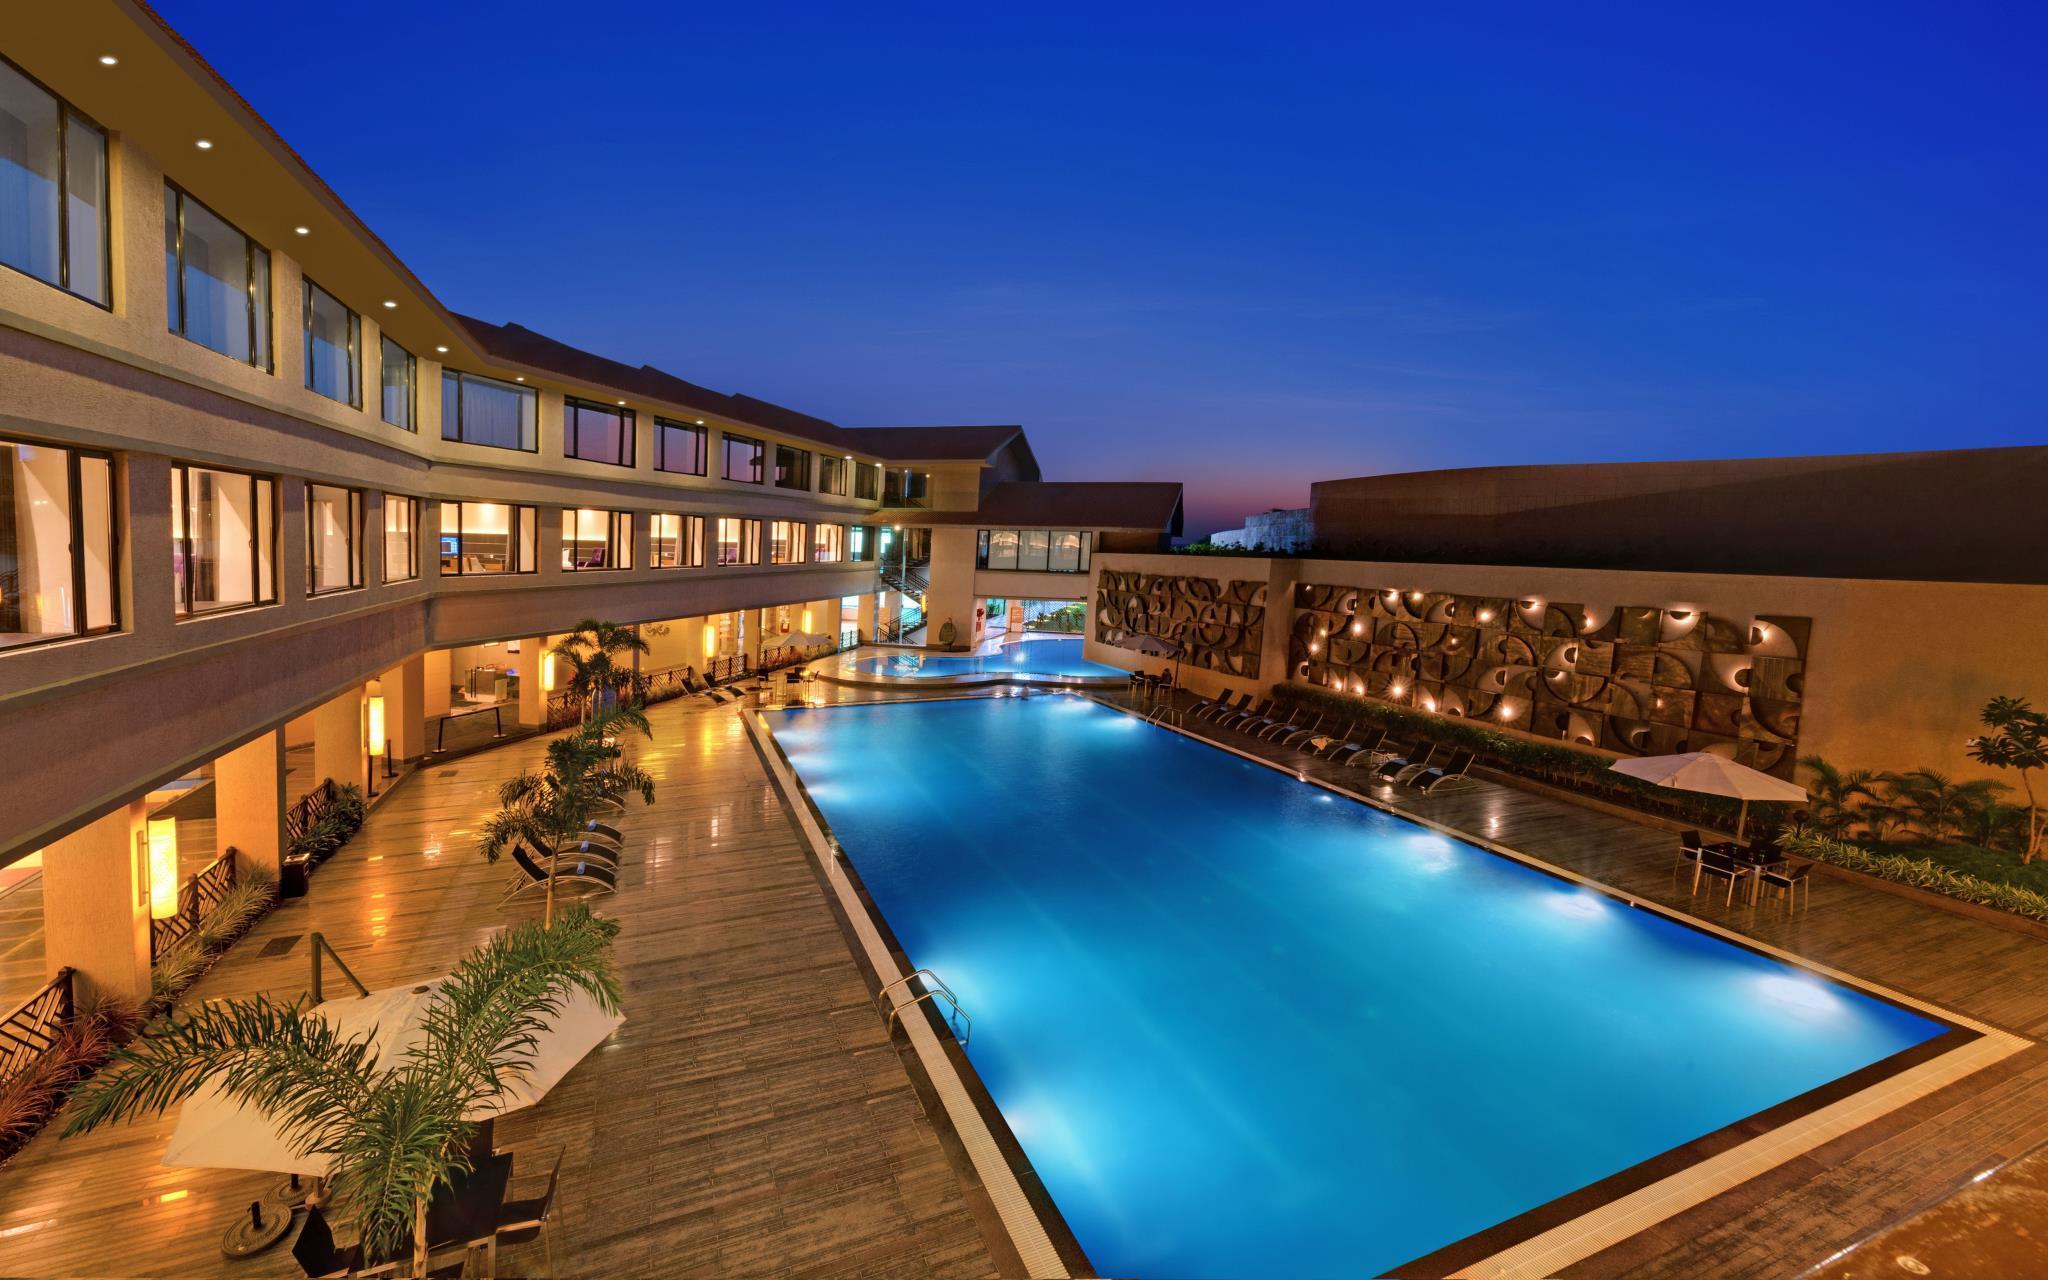 The Fern Bhavnagar - Iscon Club and Resort, Bhavnagar